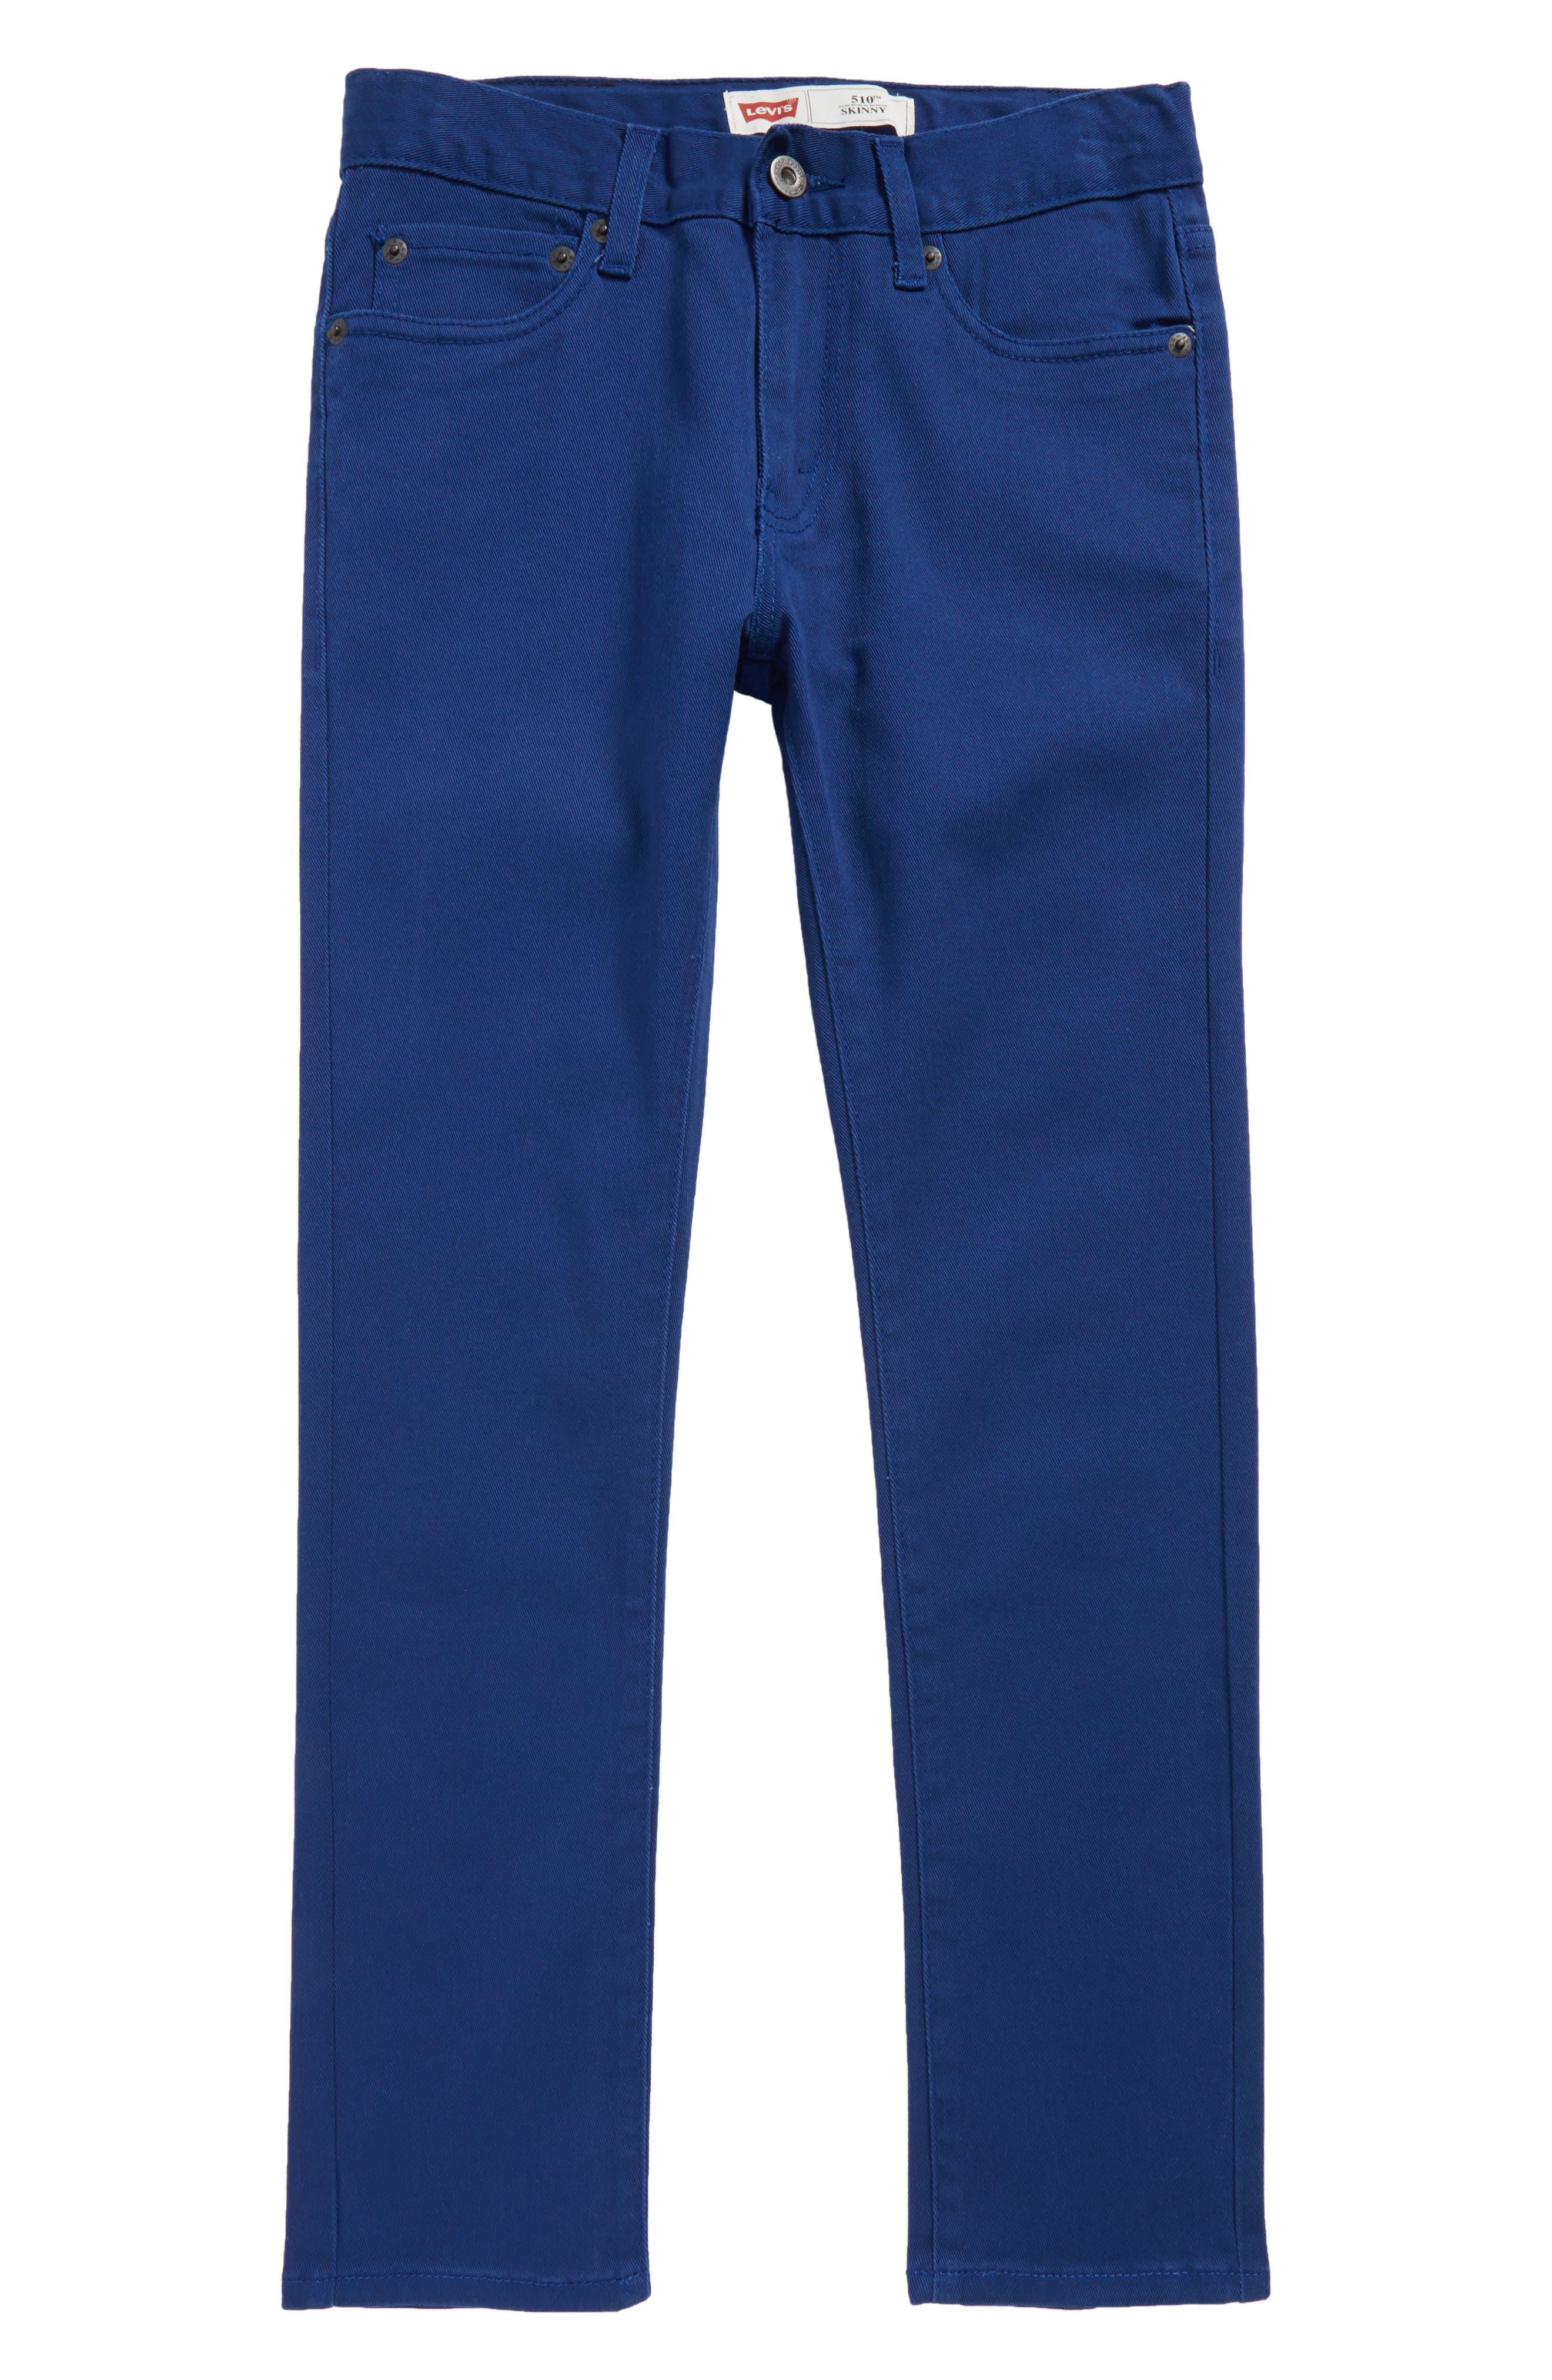 Main Image - Levi's® 510™ Skinny Fit Jeans (Toddler Boys, Little Boys & Big Boys)